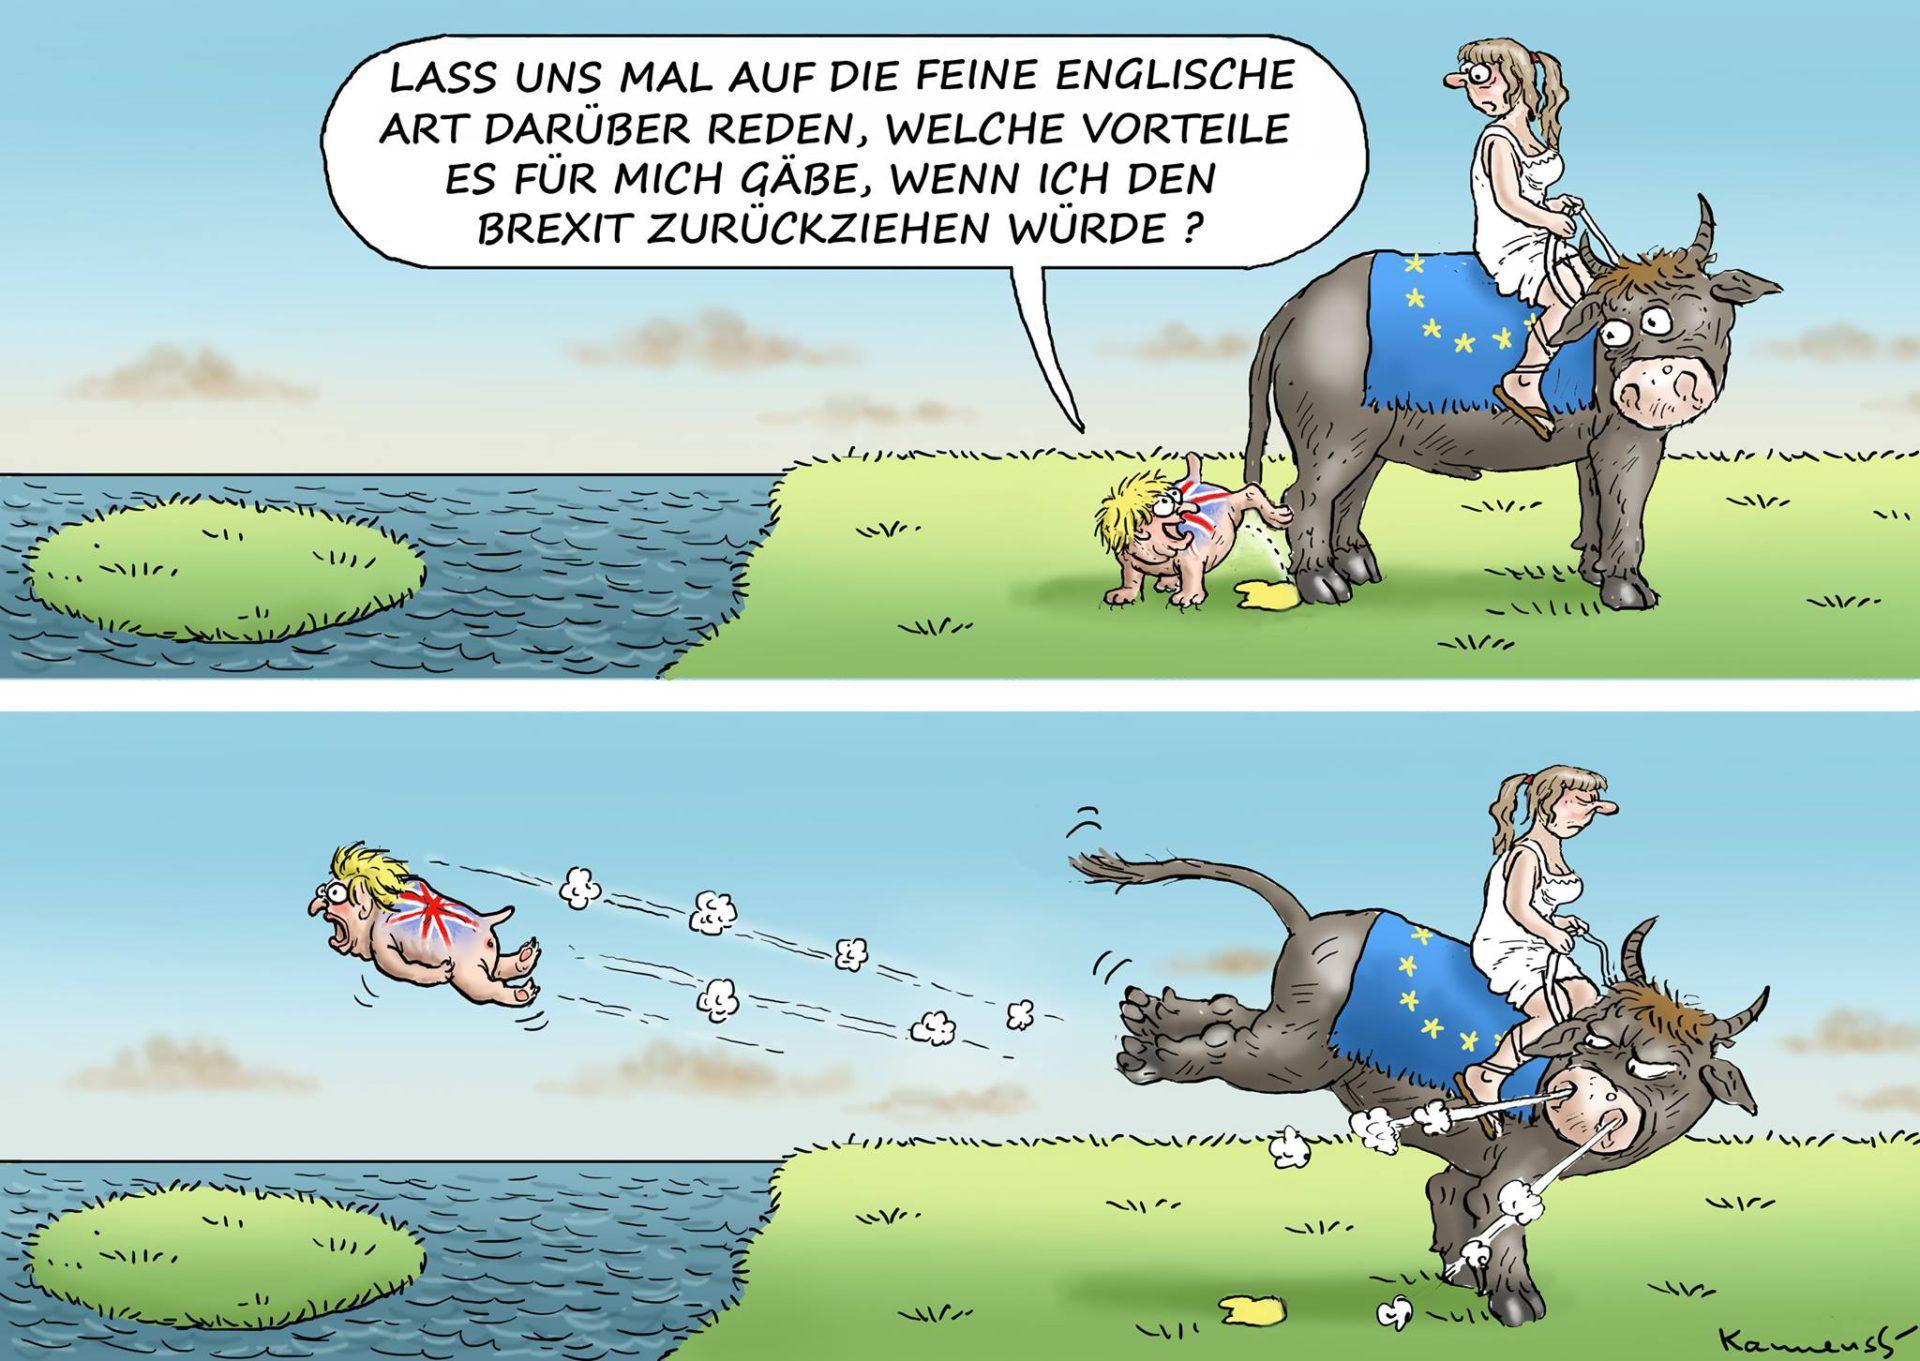 071-02 Kamensky Brexit Johnson